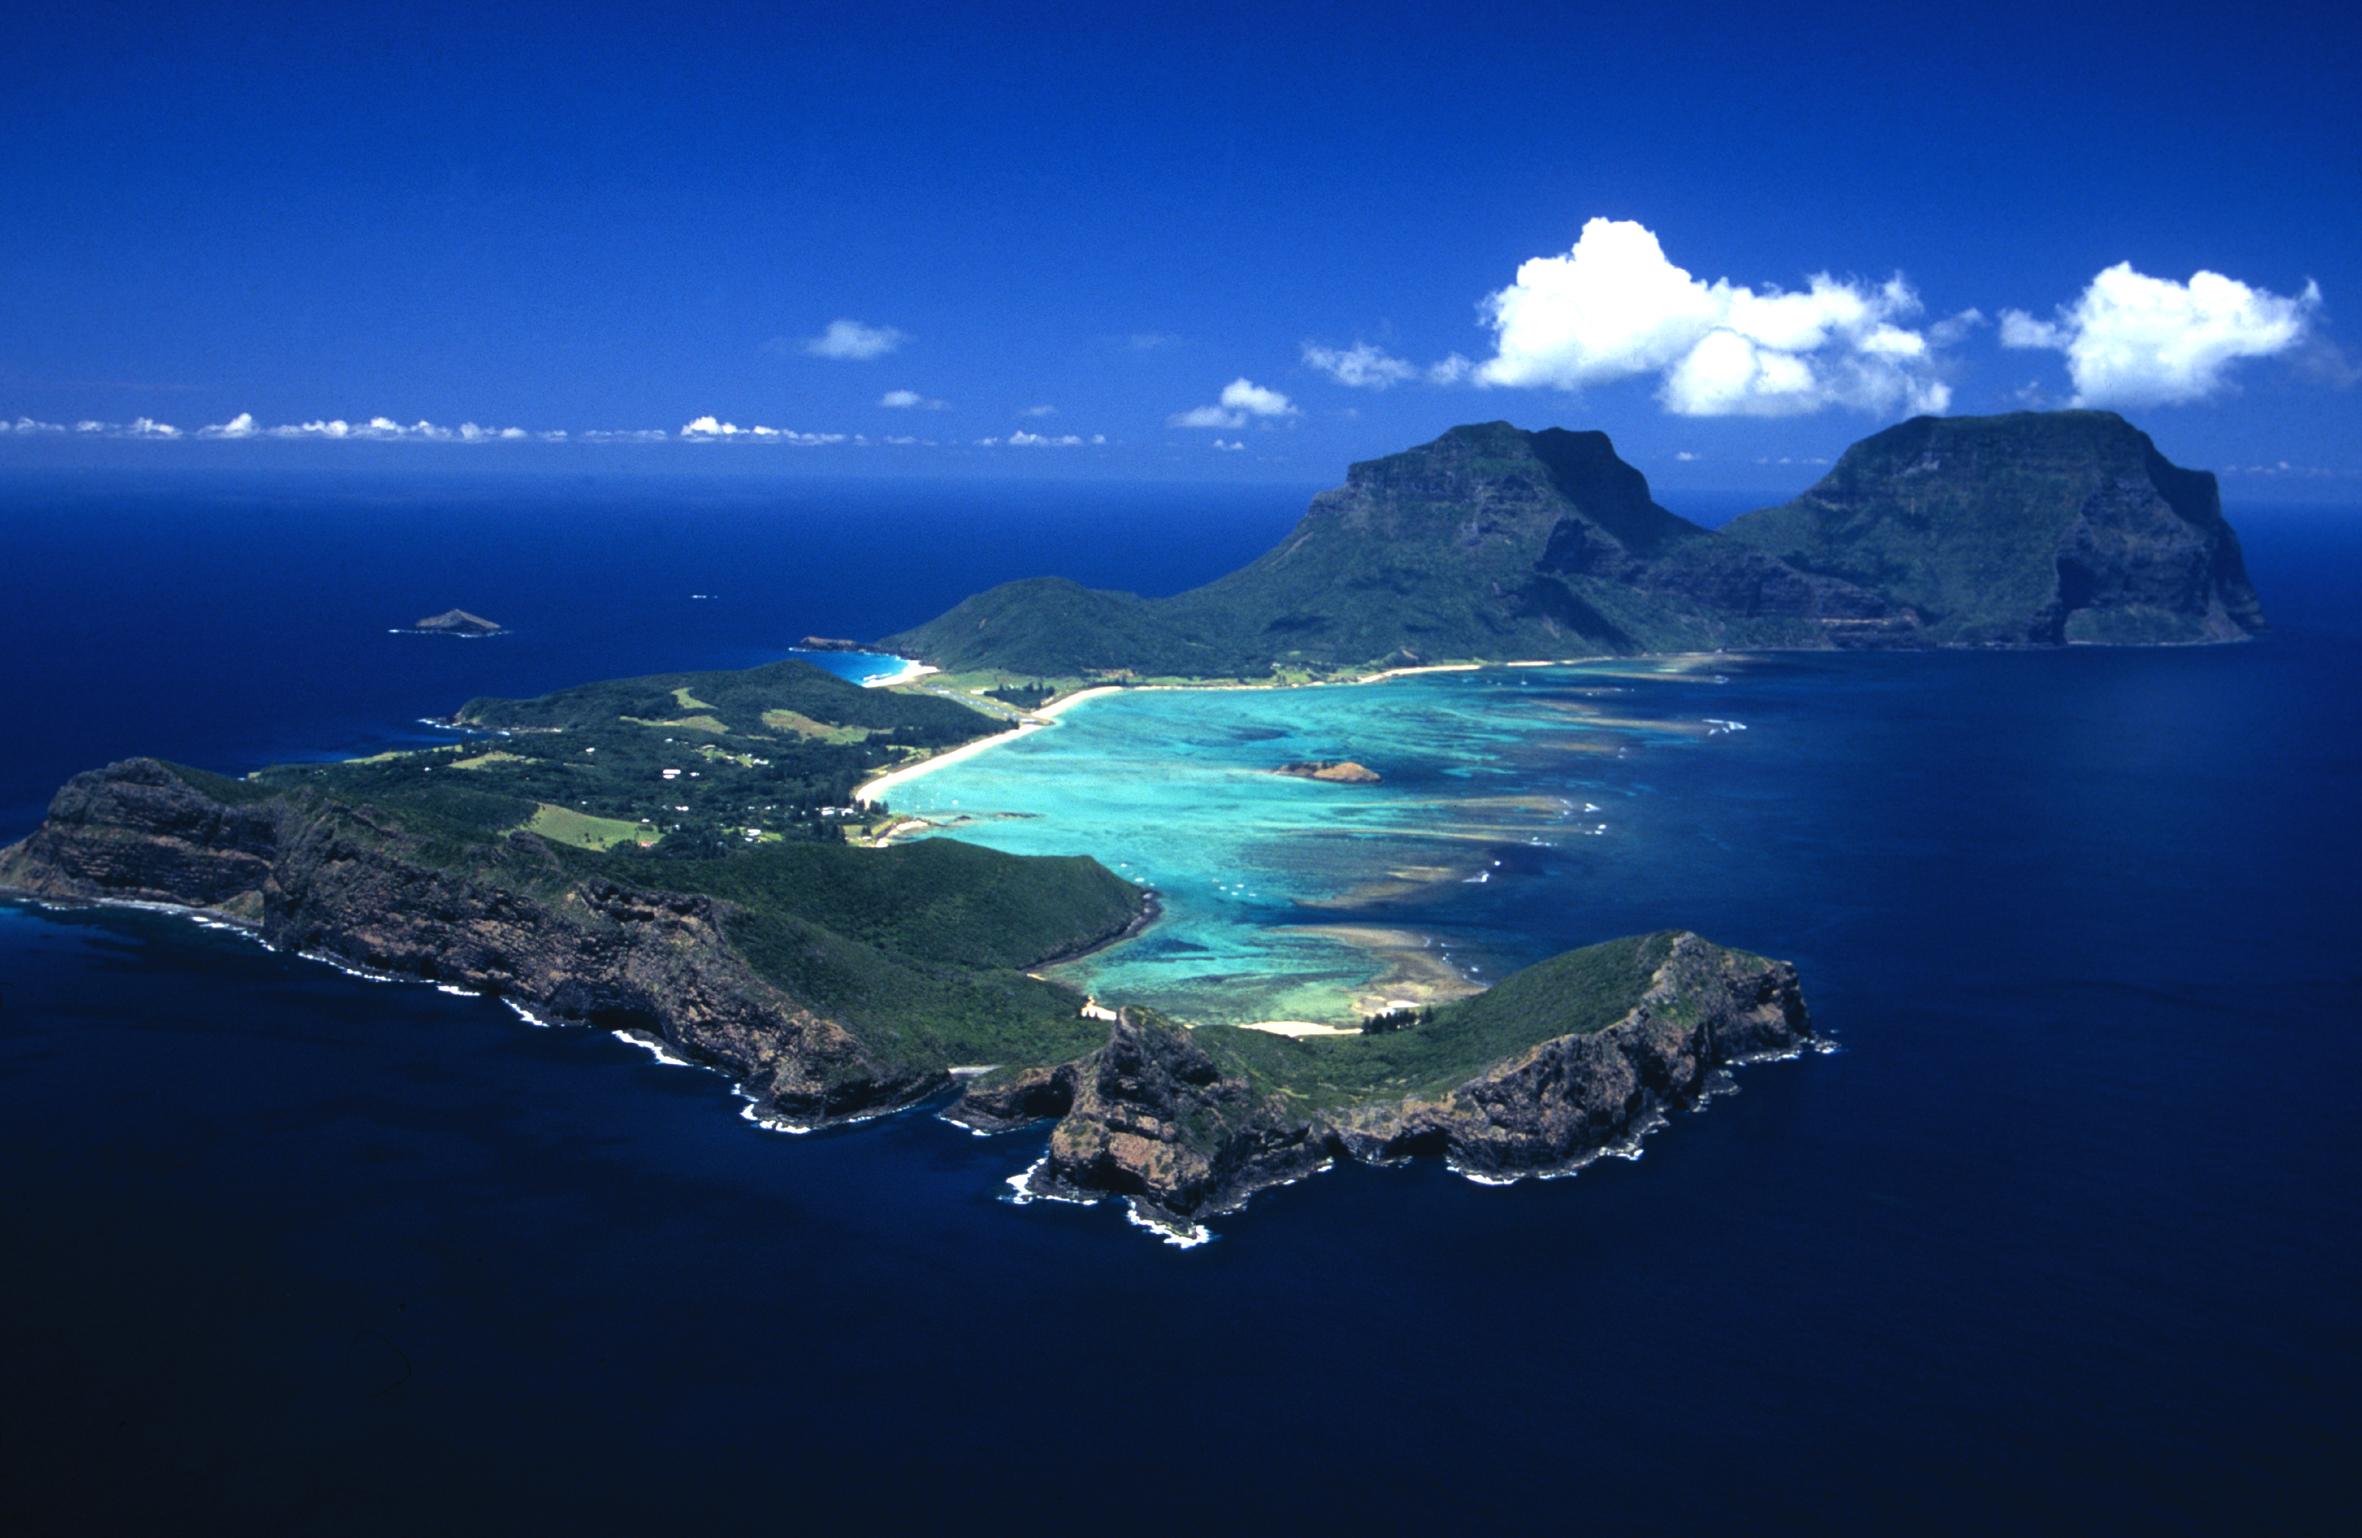 lord-howe-island-aerial-view